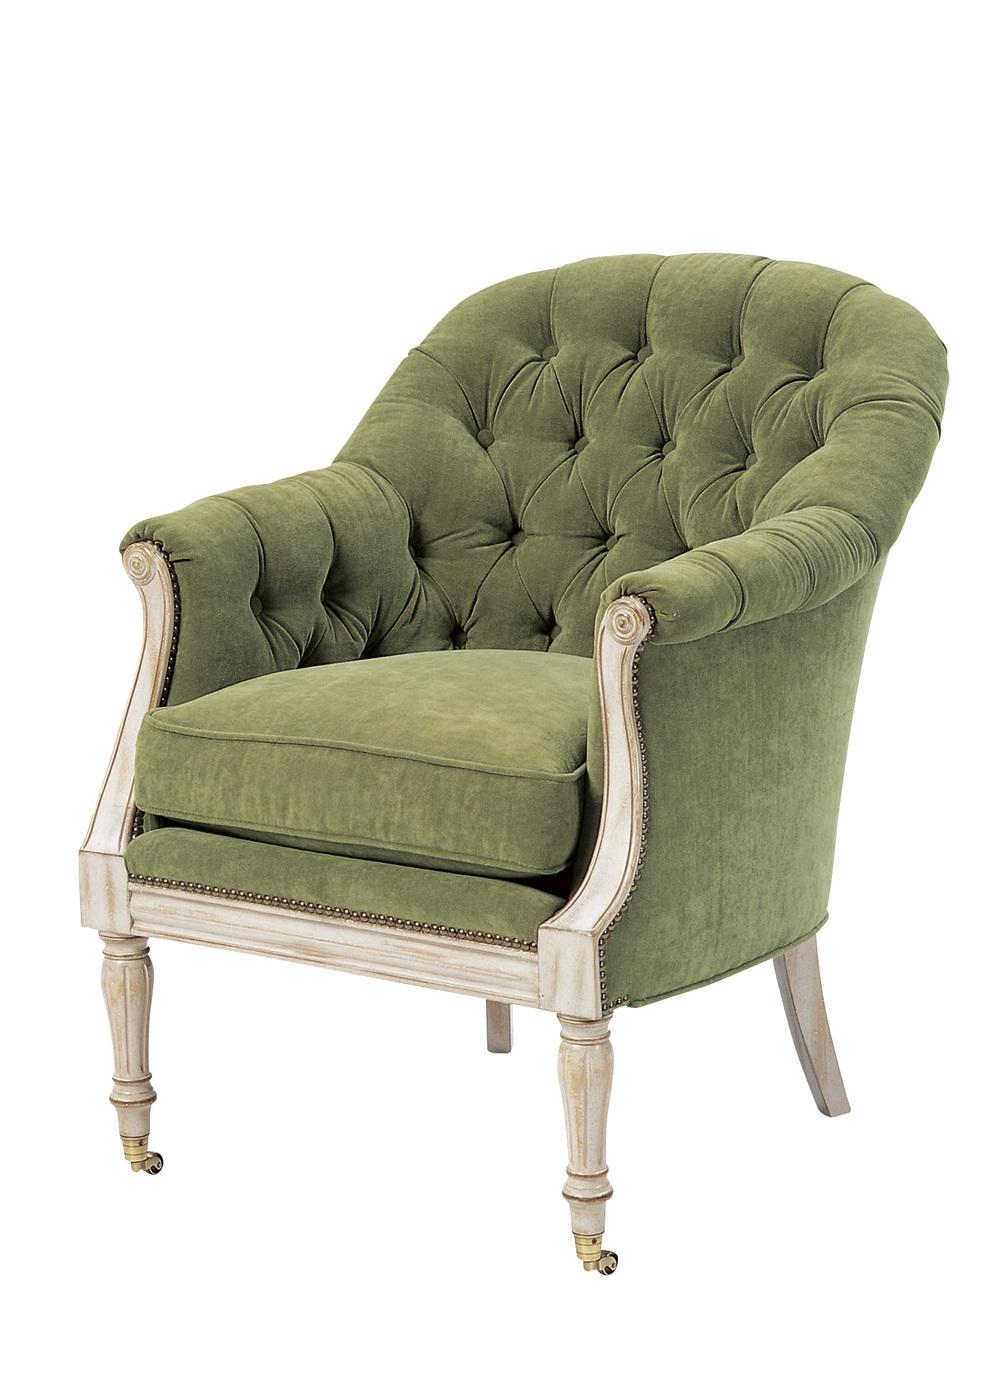 WESLEY HALL, INC. - Richmond Chair